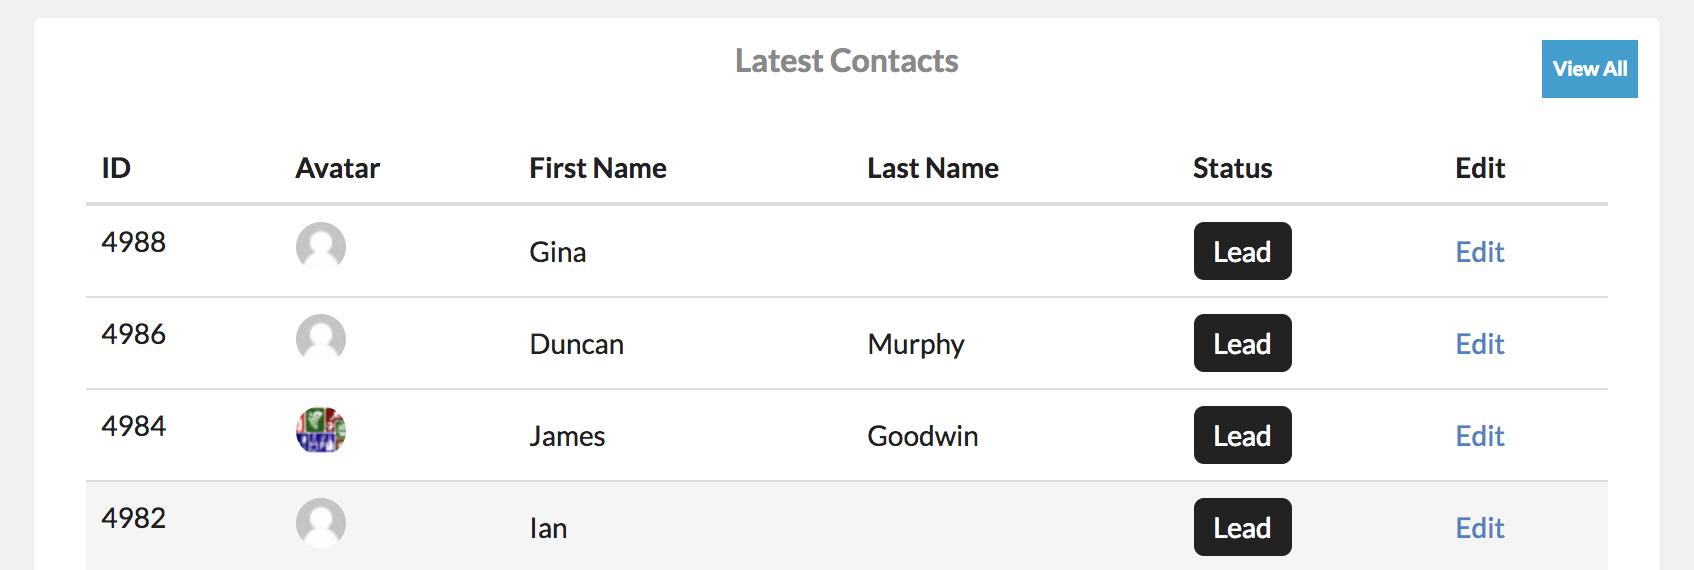 Recent CRM Contact List